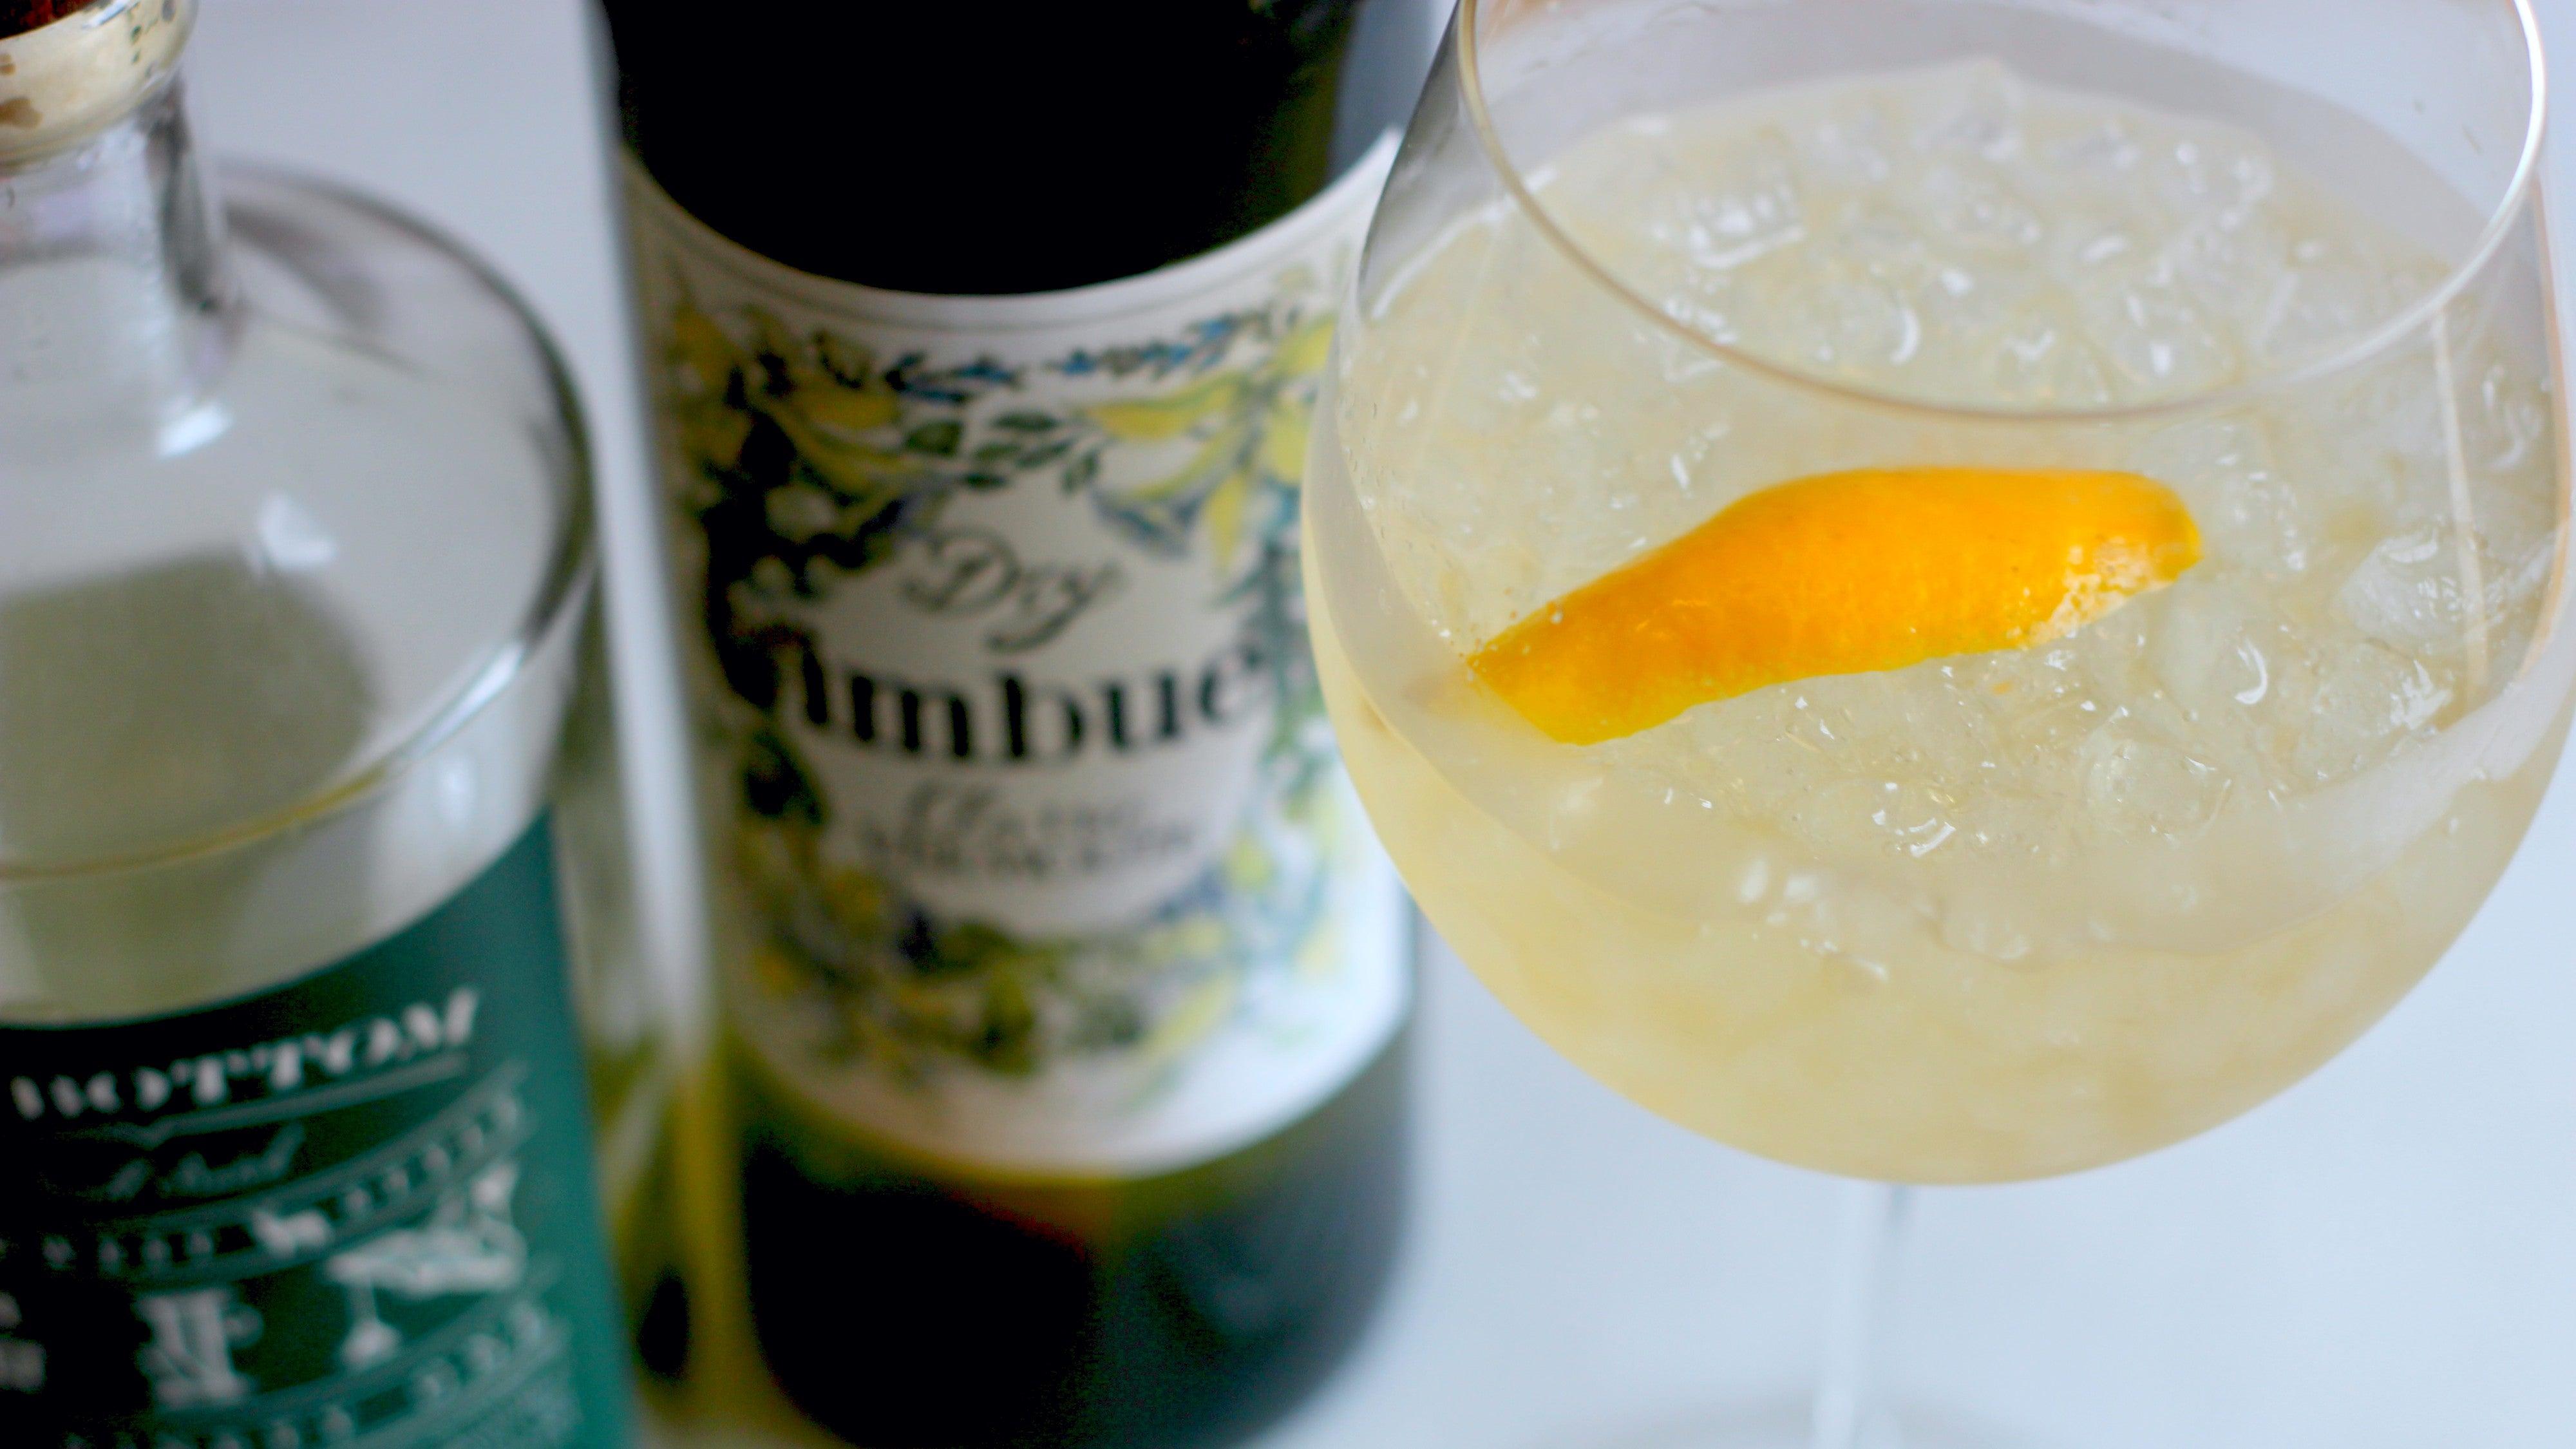 3-Ingredient Happy Hour: Julia Child's Favourite Martini